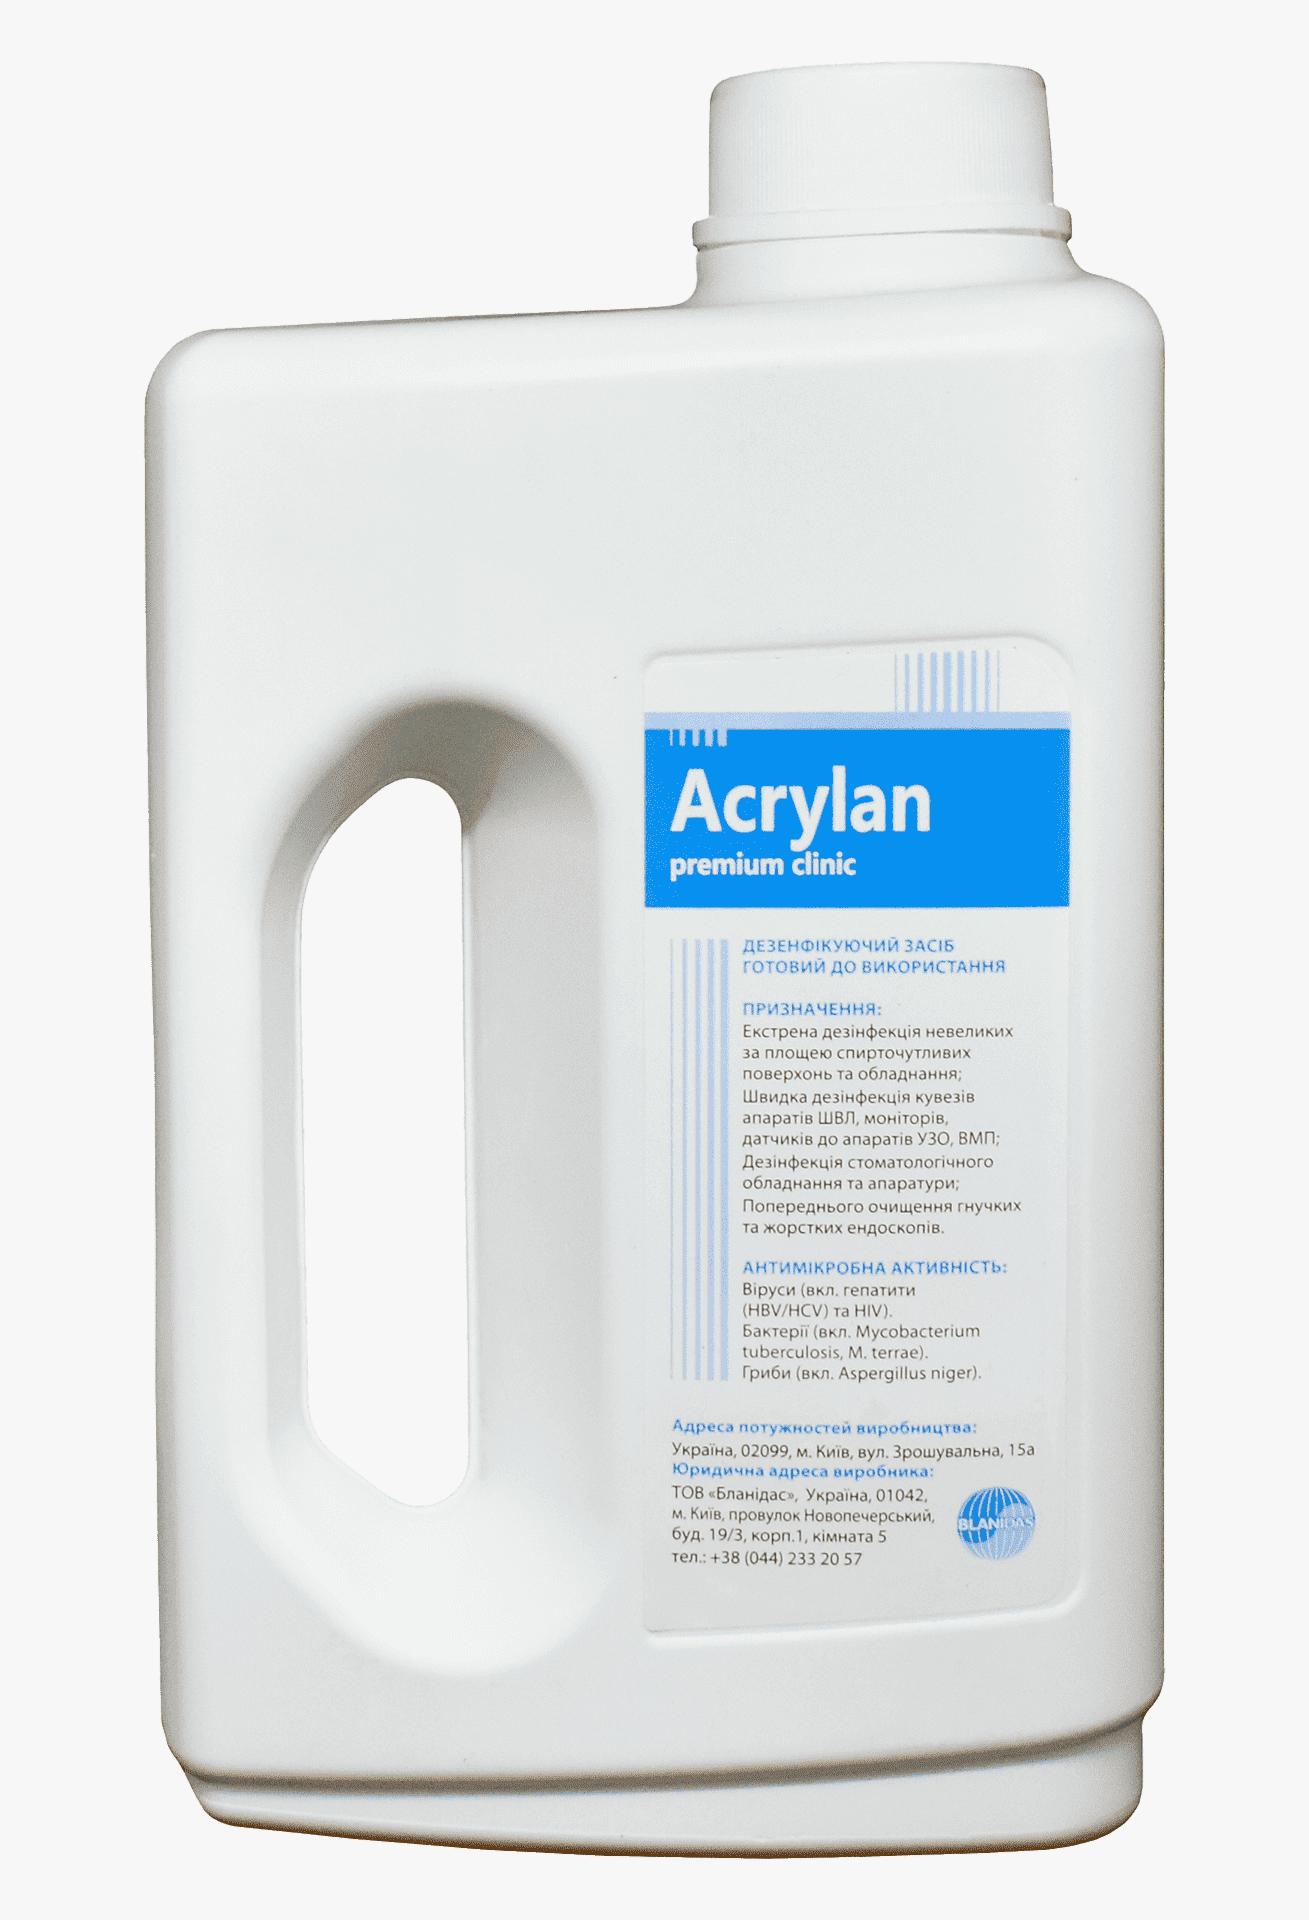 Акрилан преміум клінік, 2.5л